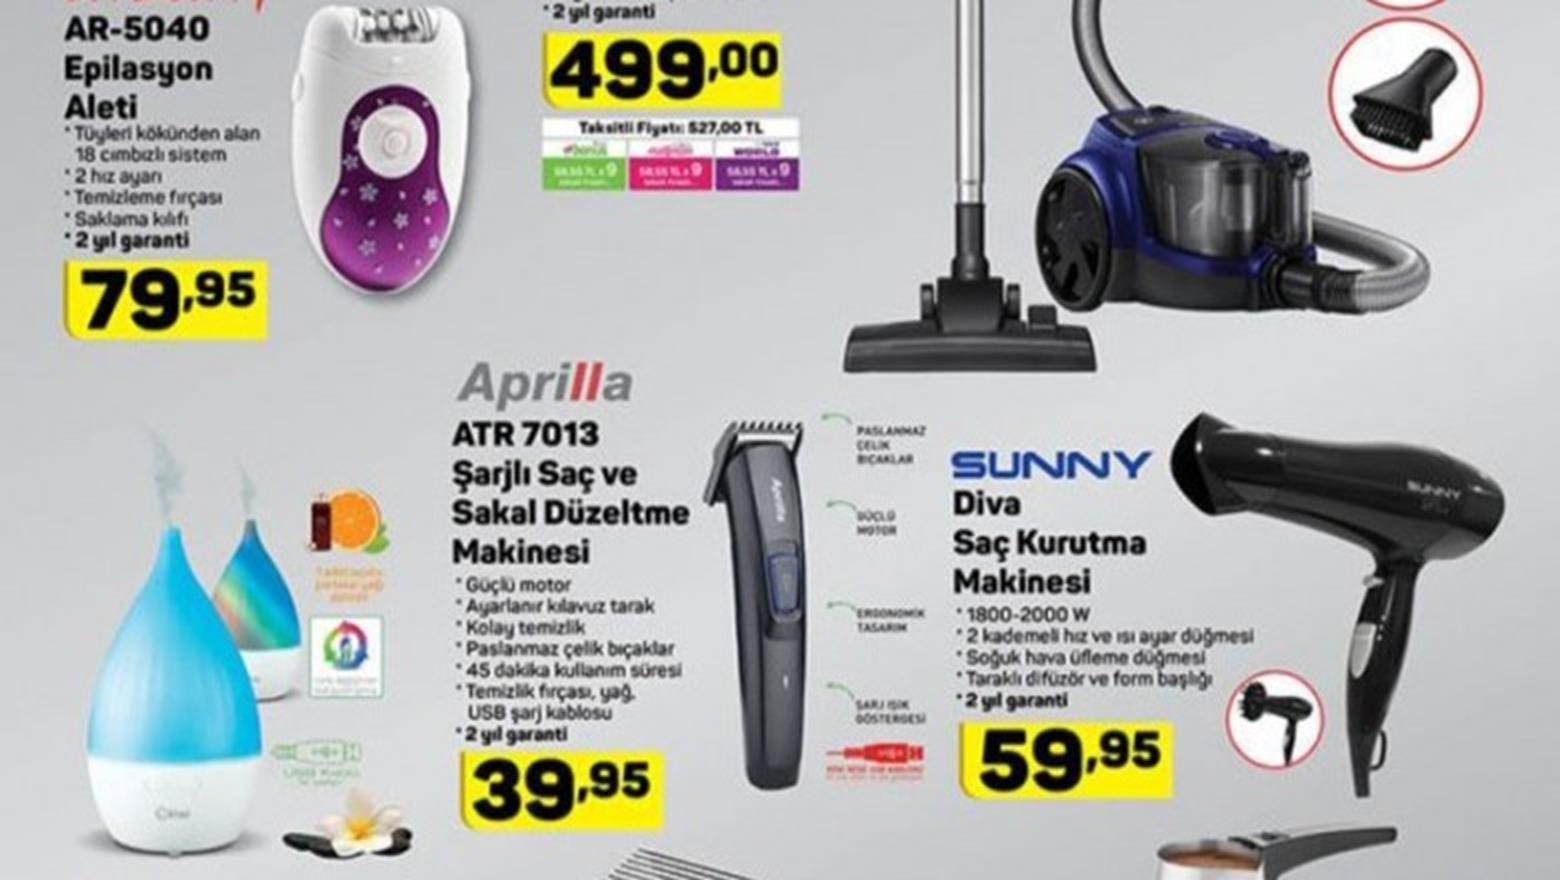 A101 Aktuel Urunler Gelecek A101 Katalogu In 2020 Hair Dryer